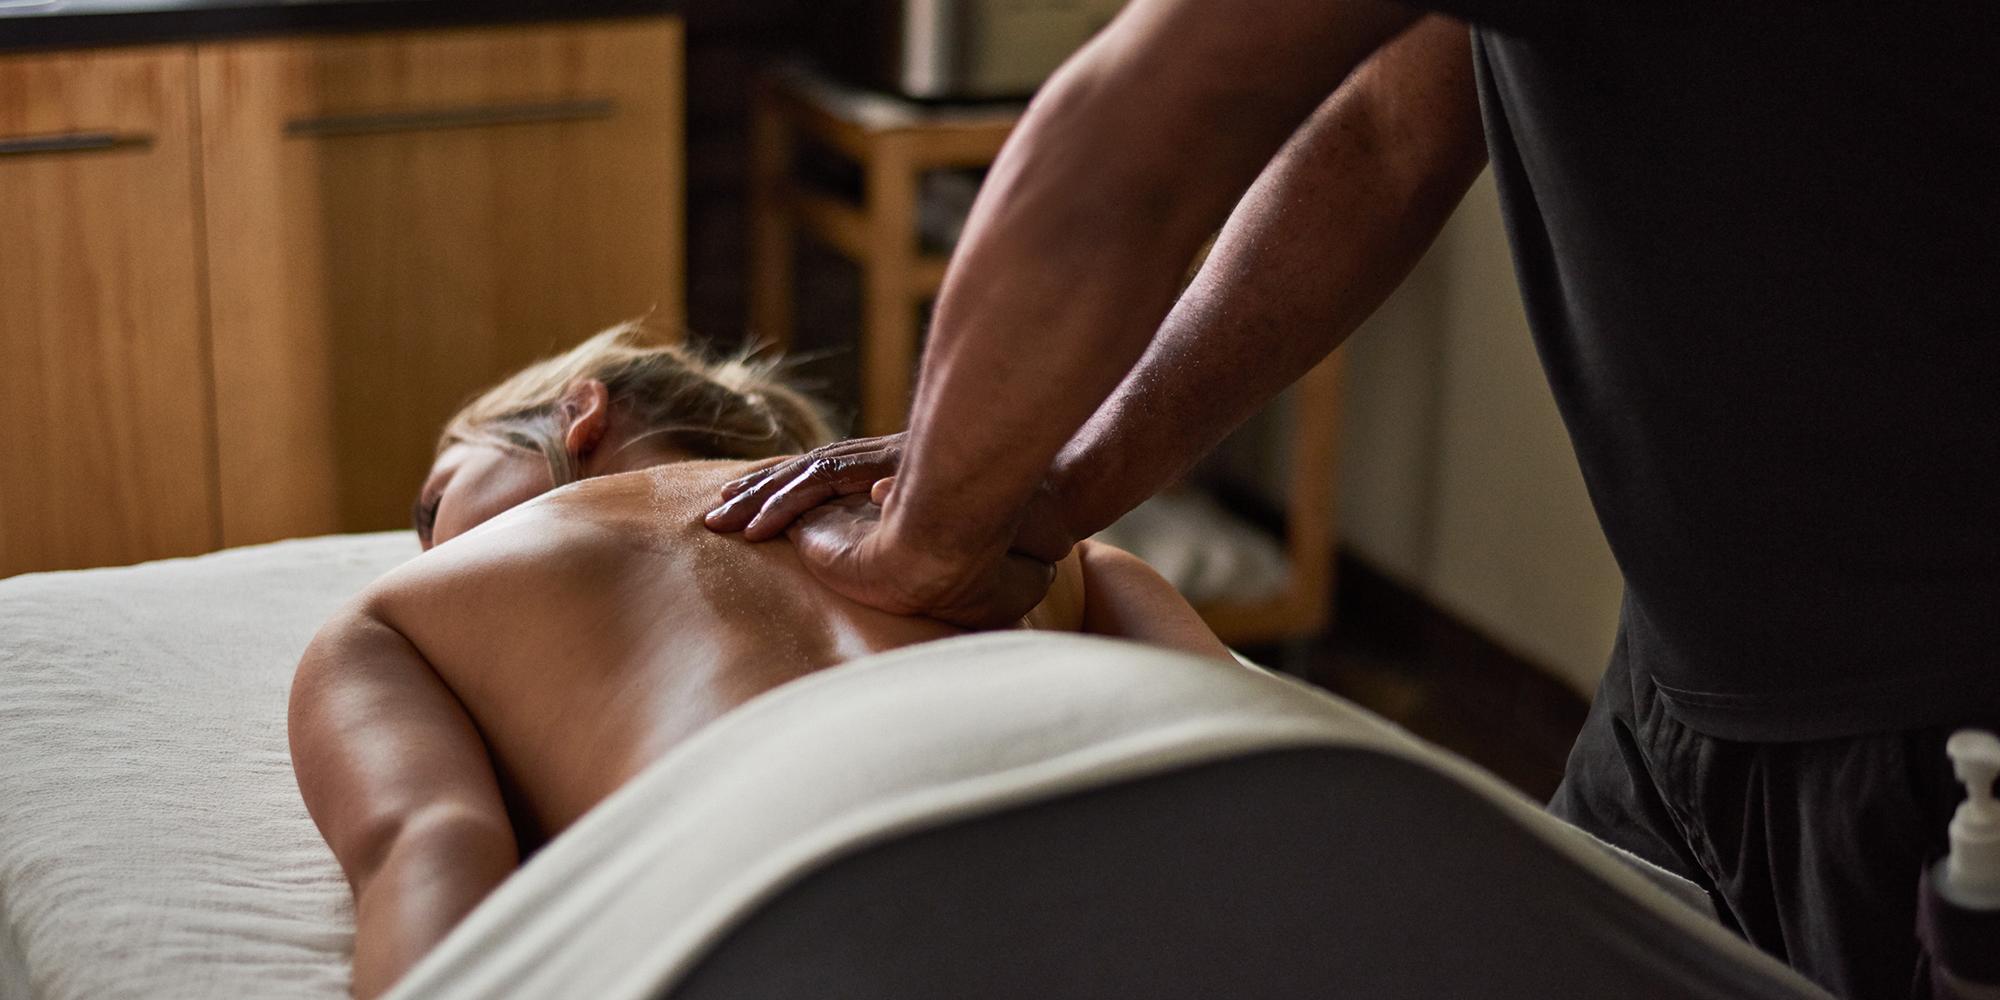 Hydrothermëa massage